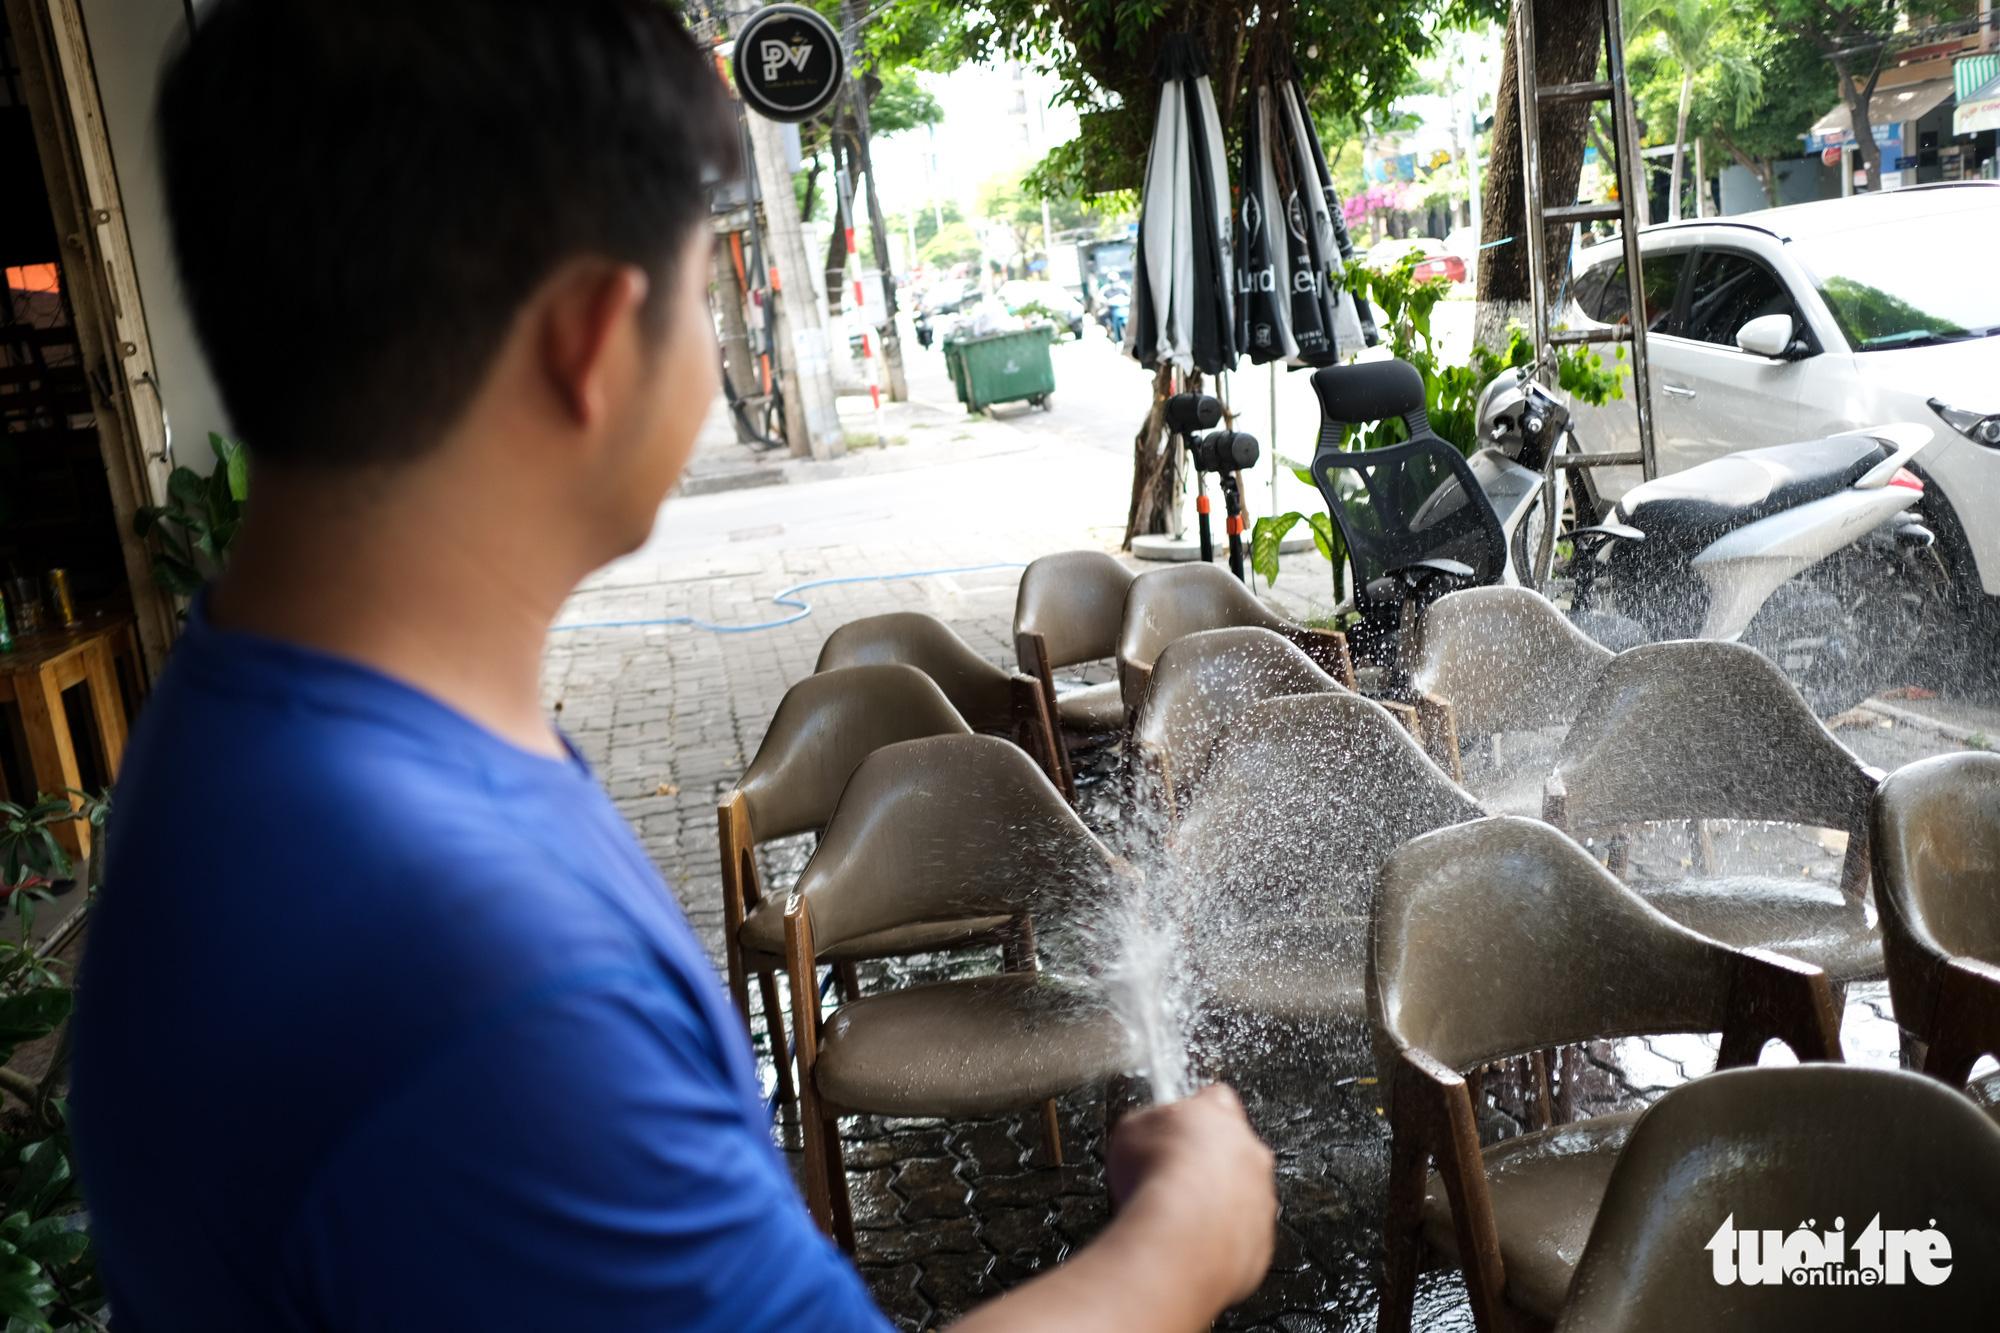 Restaurants, cafés in Da Nang resume sit-down service